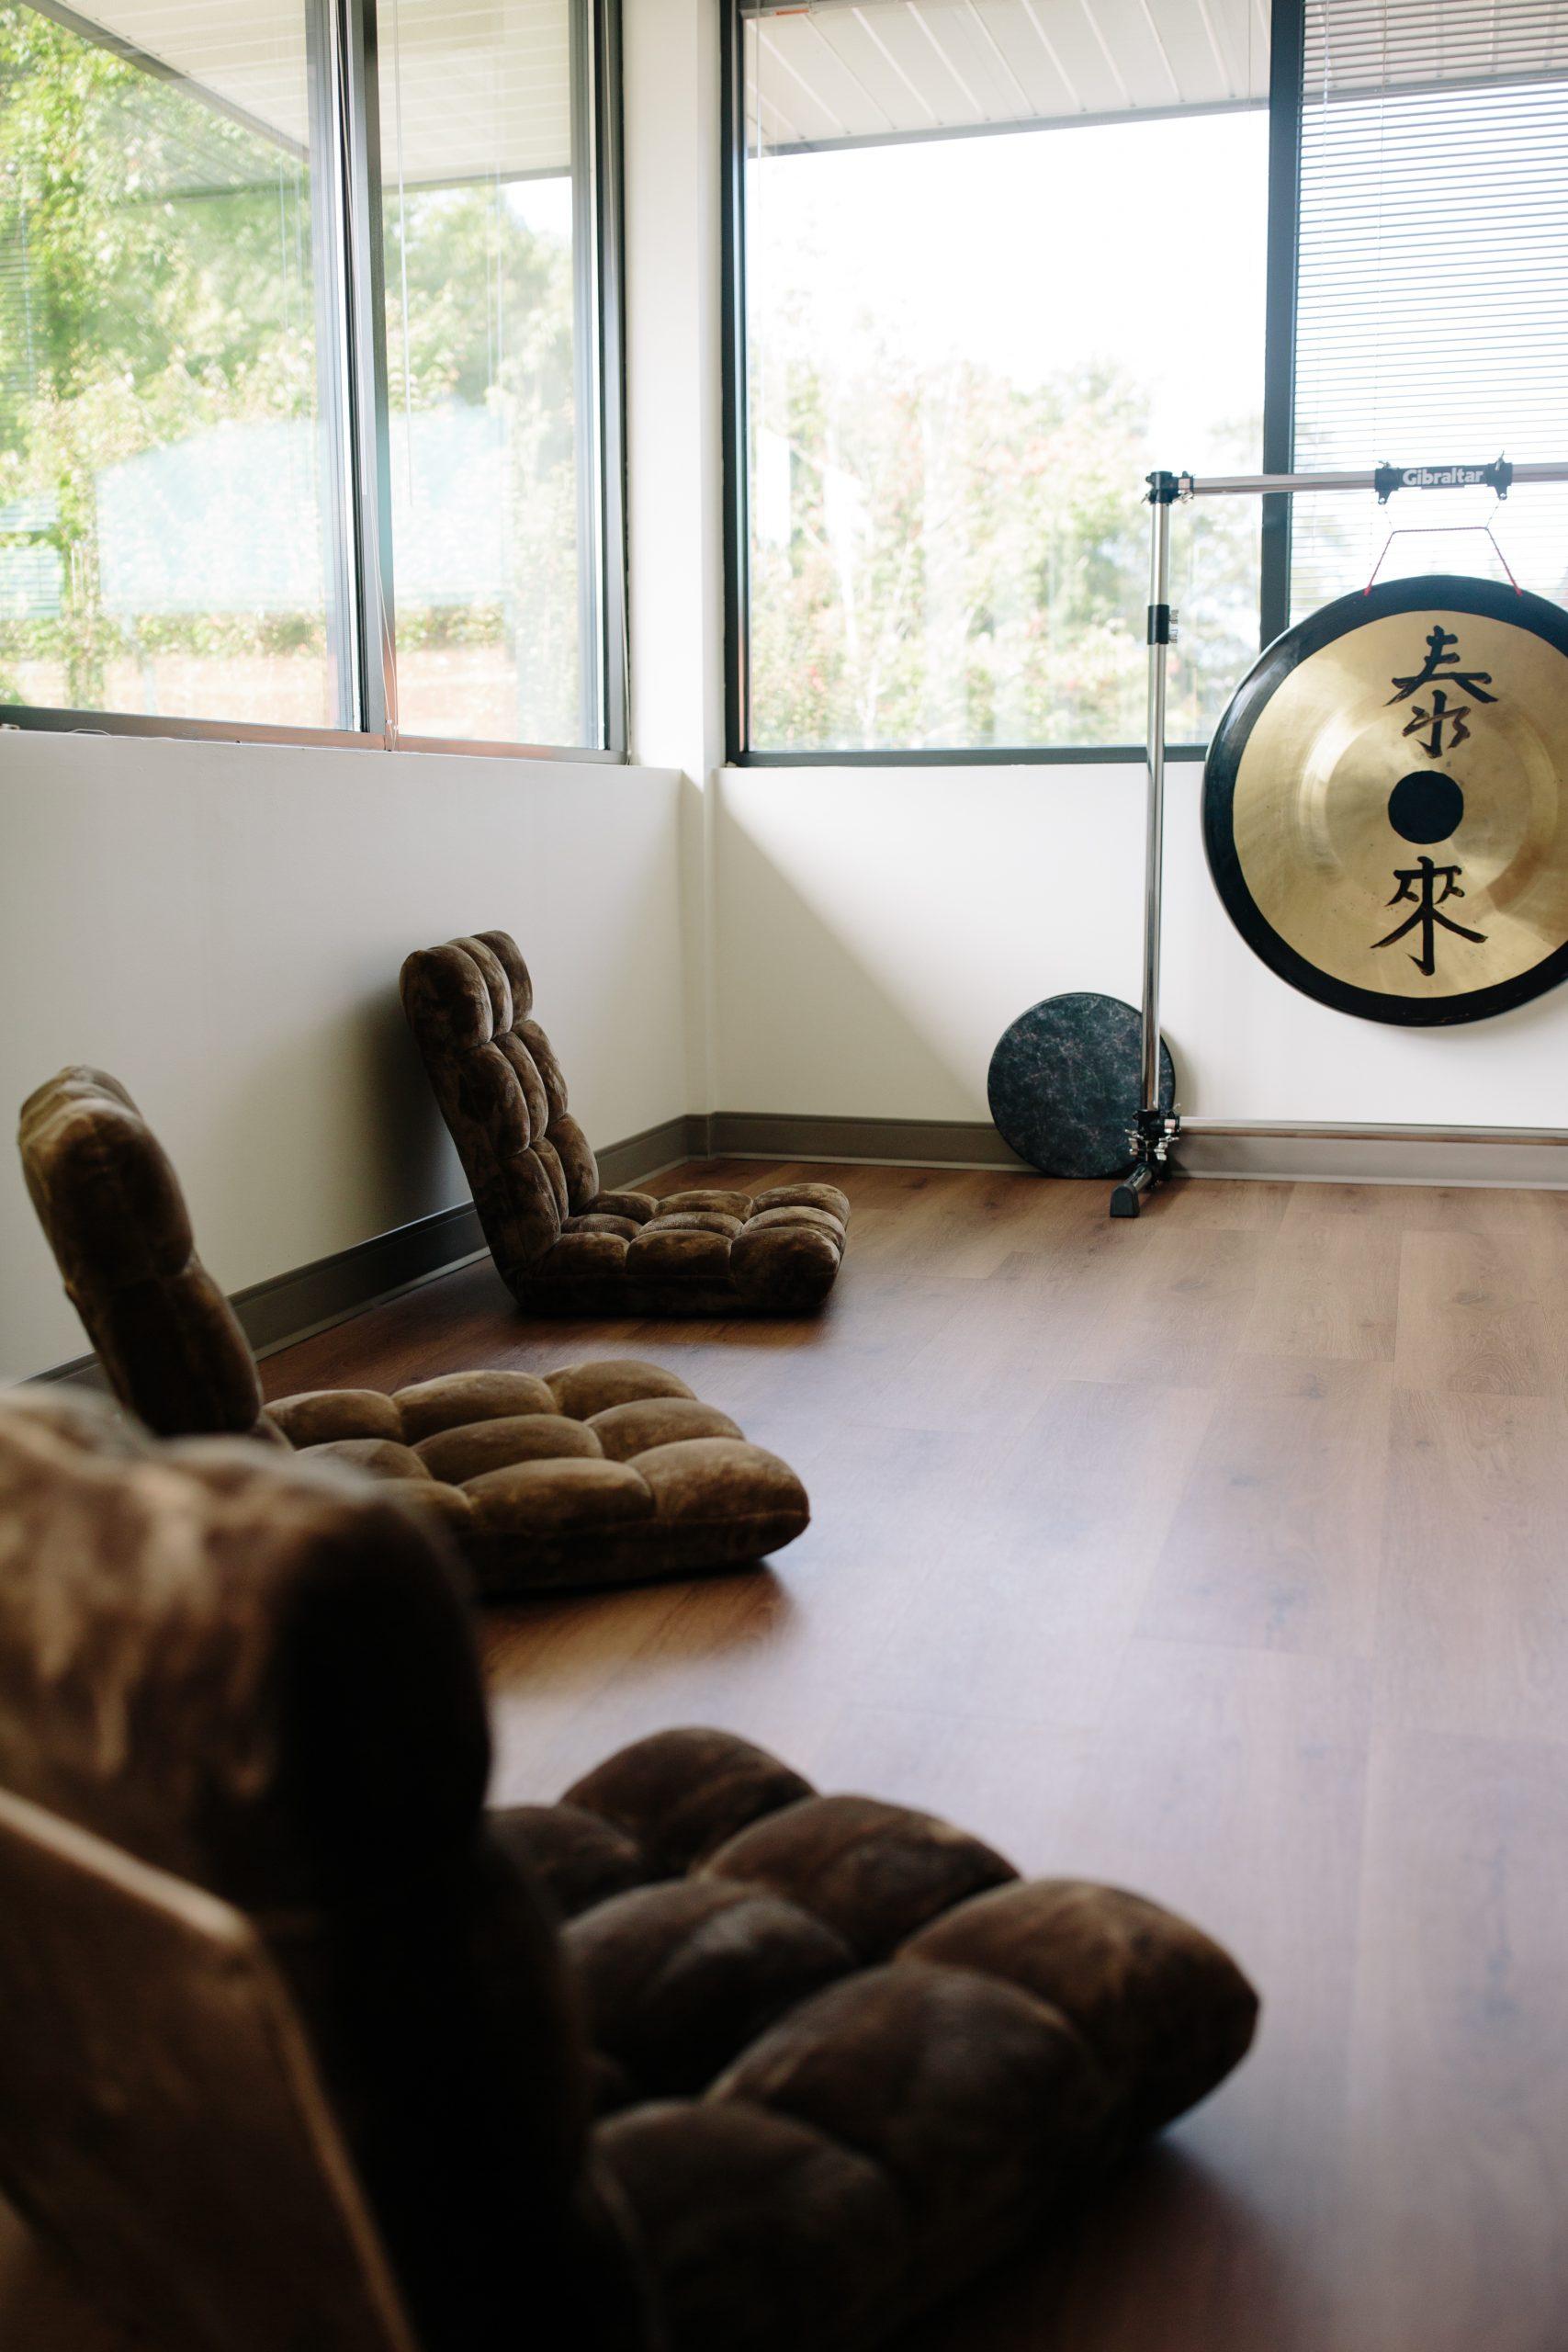 Sound Bath, Meditation, & Breathwork